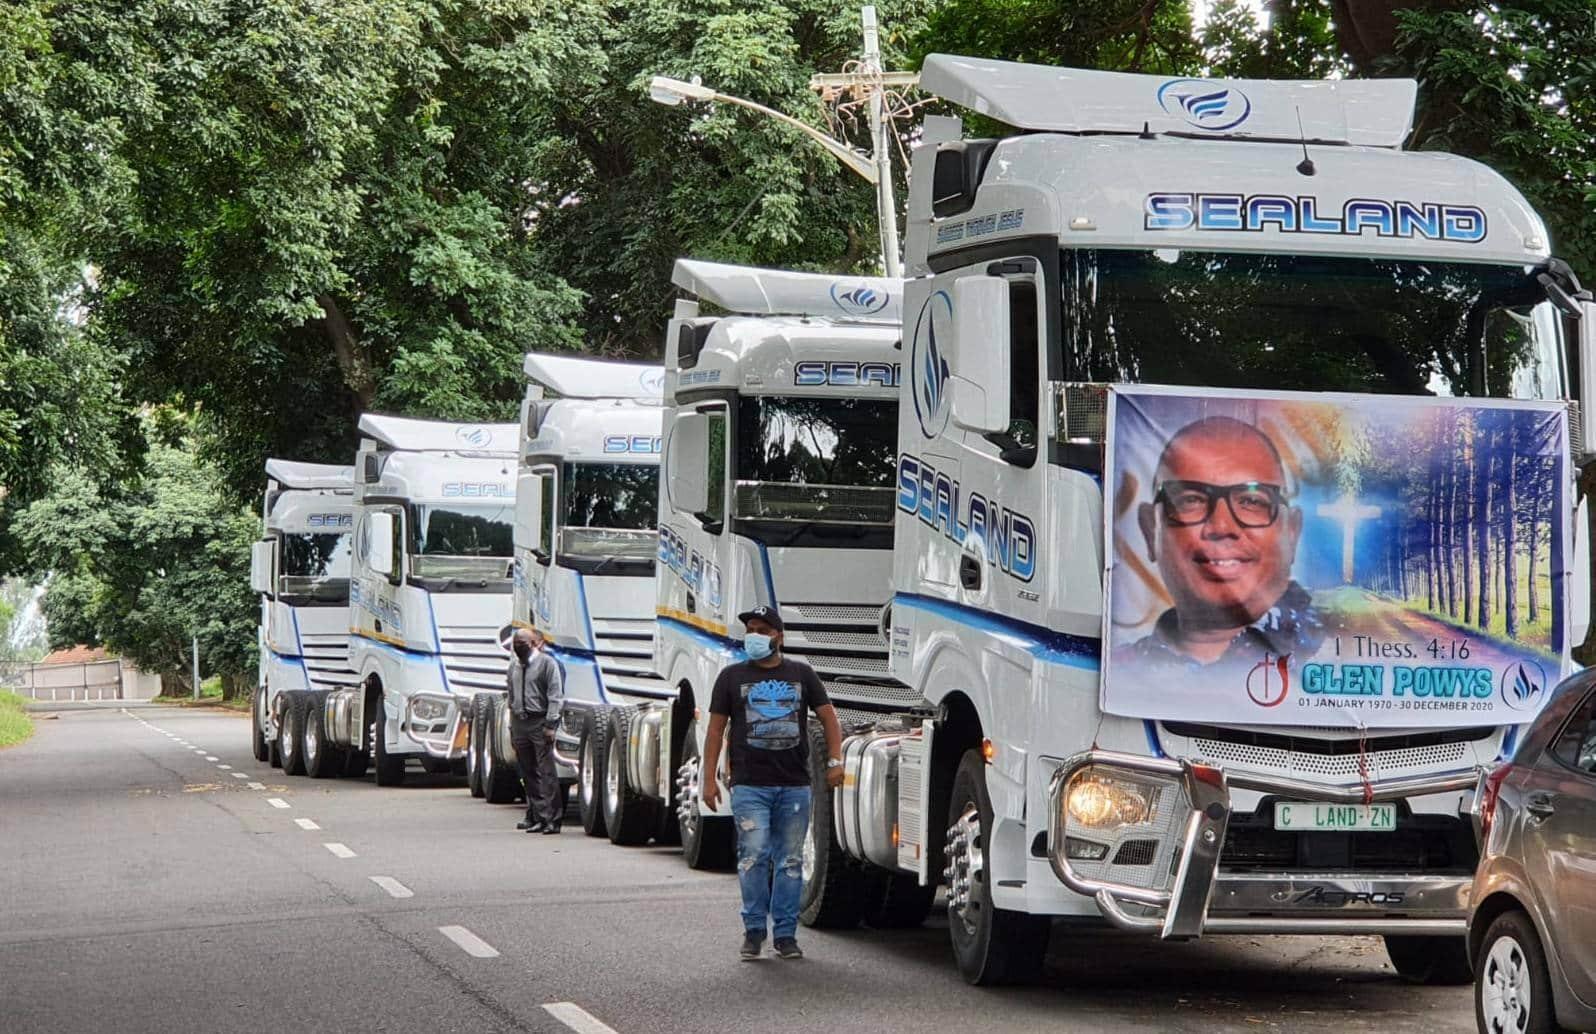 Sealand Transport bids farewell to Glen Powys